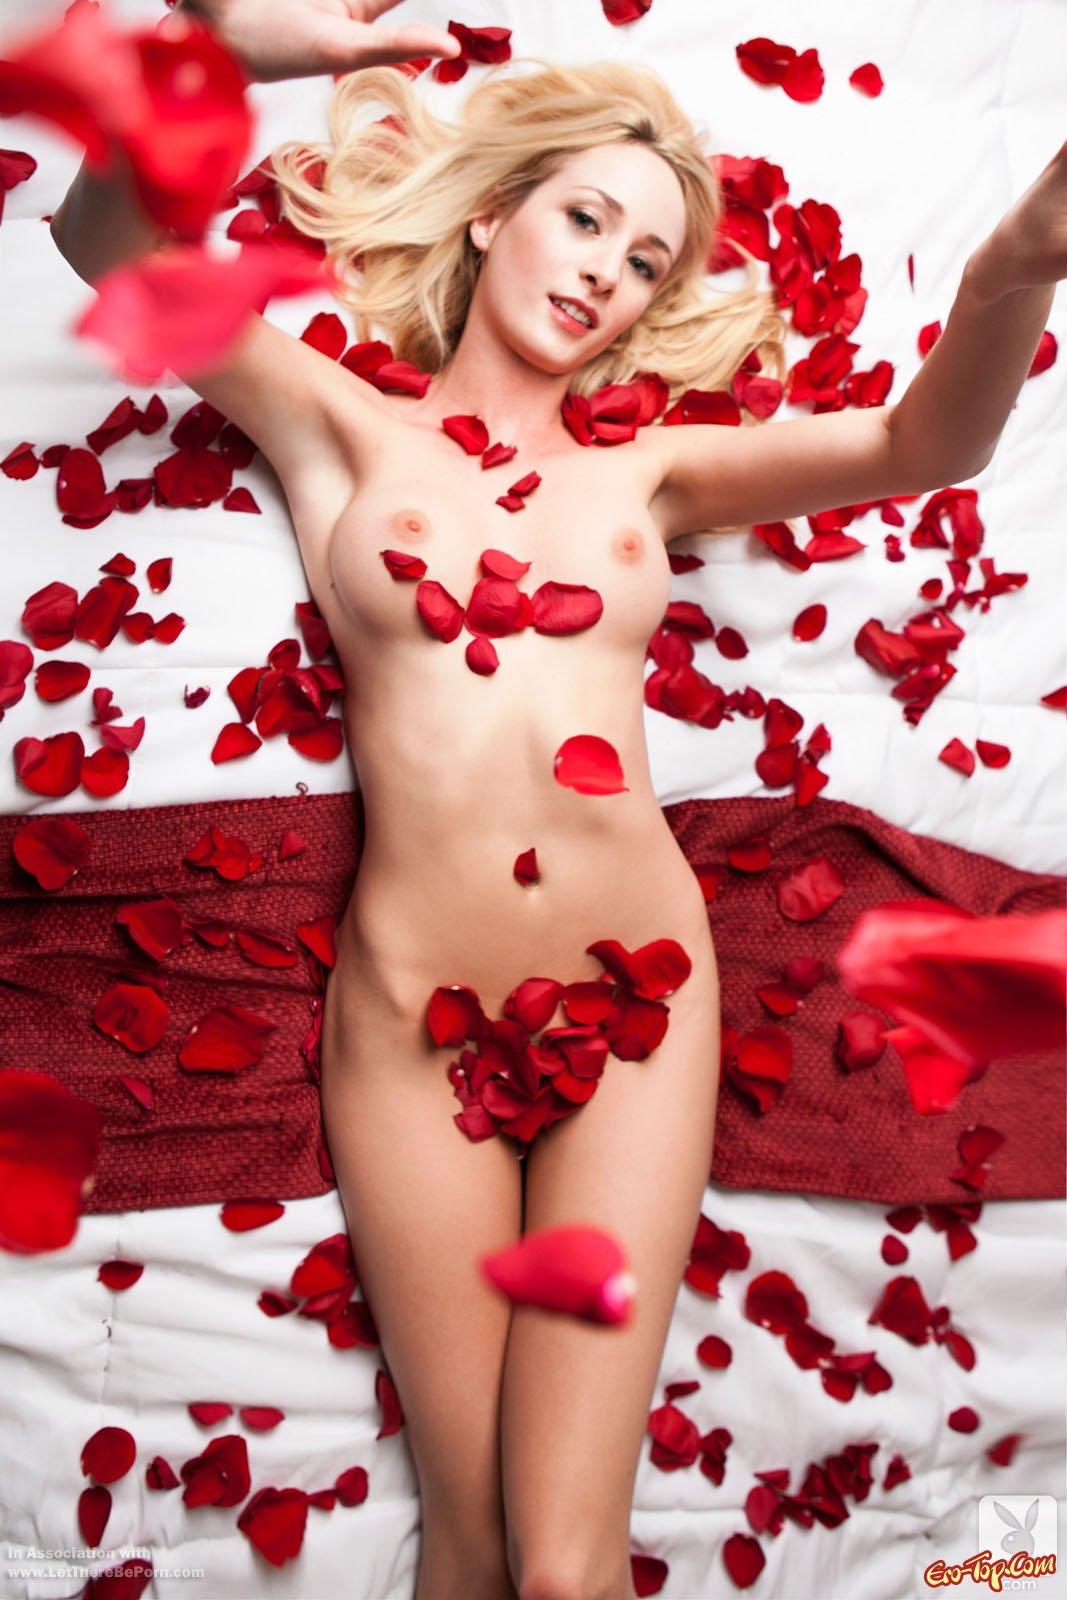 Шлюха в лепестках роз